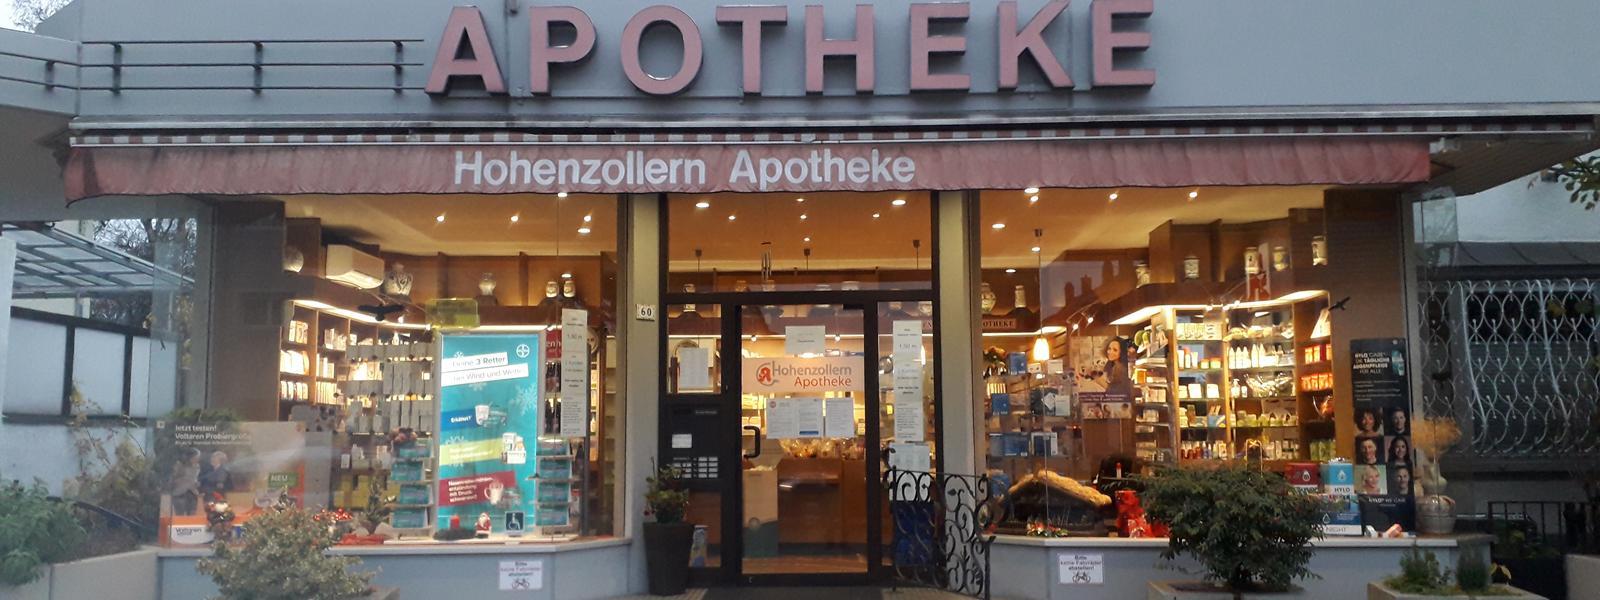 Hohenzollern Apotheke Ludwigshafen